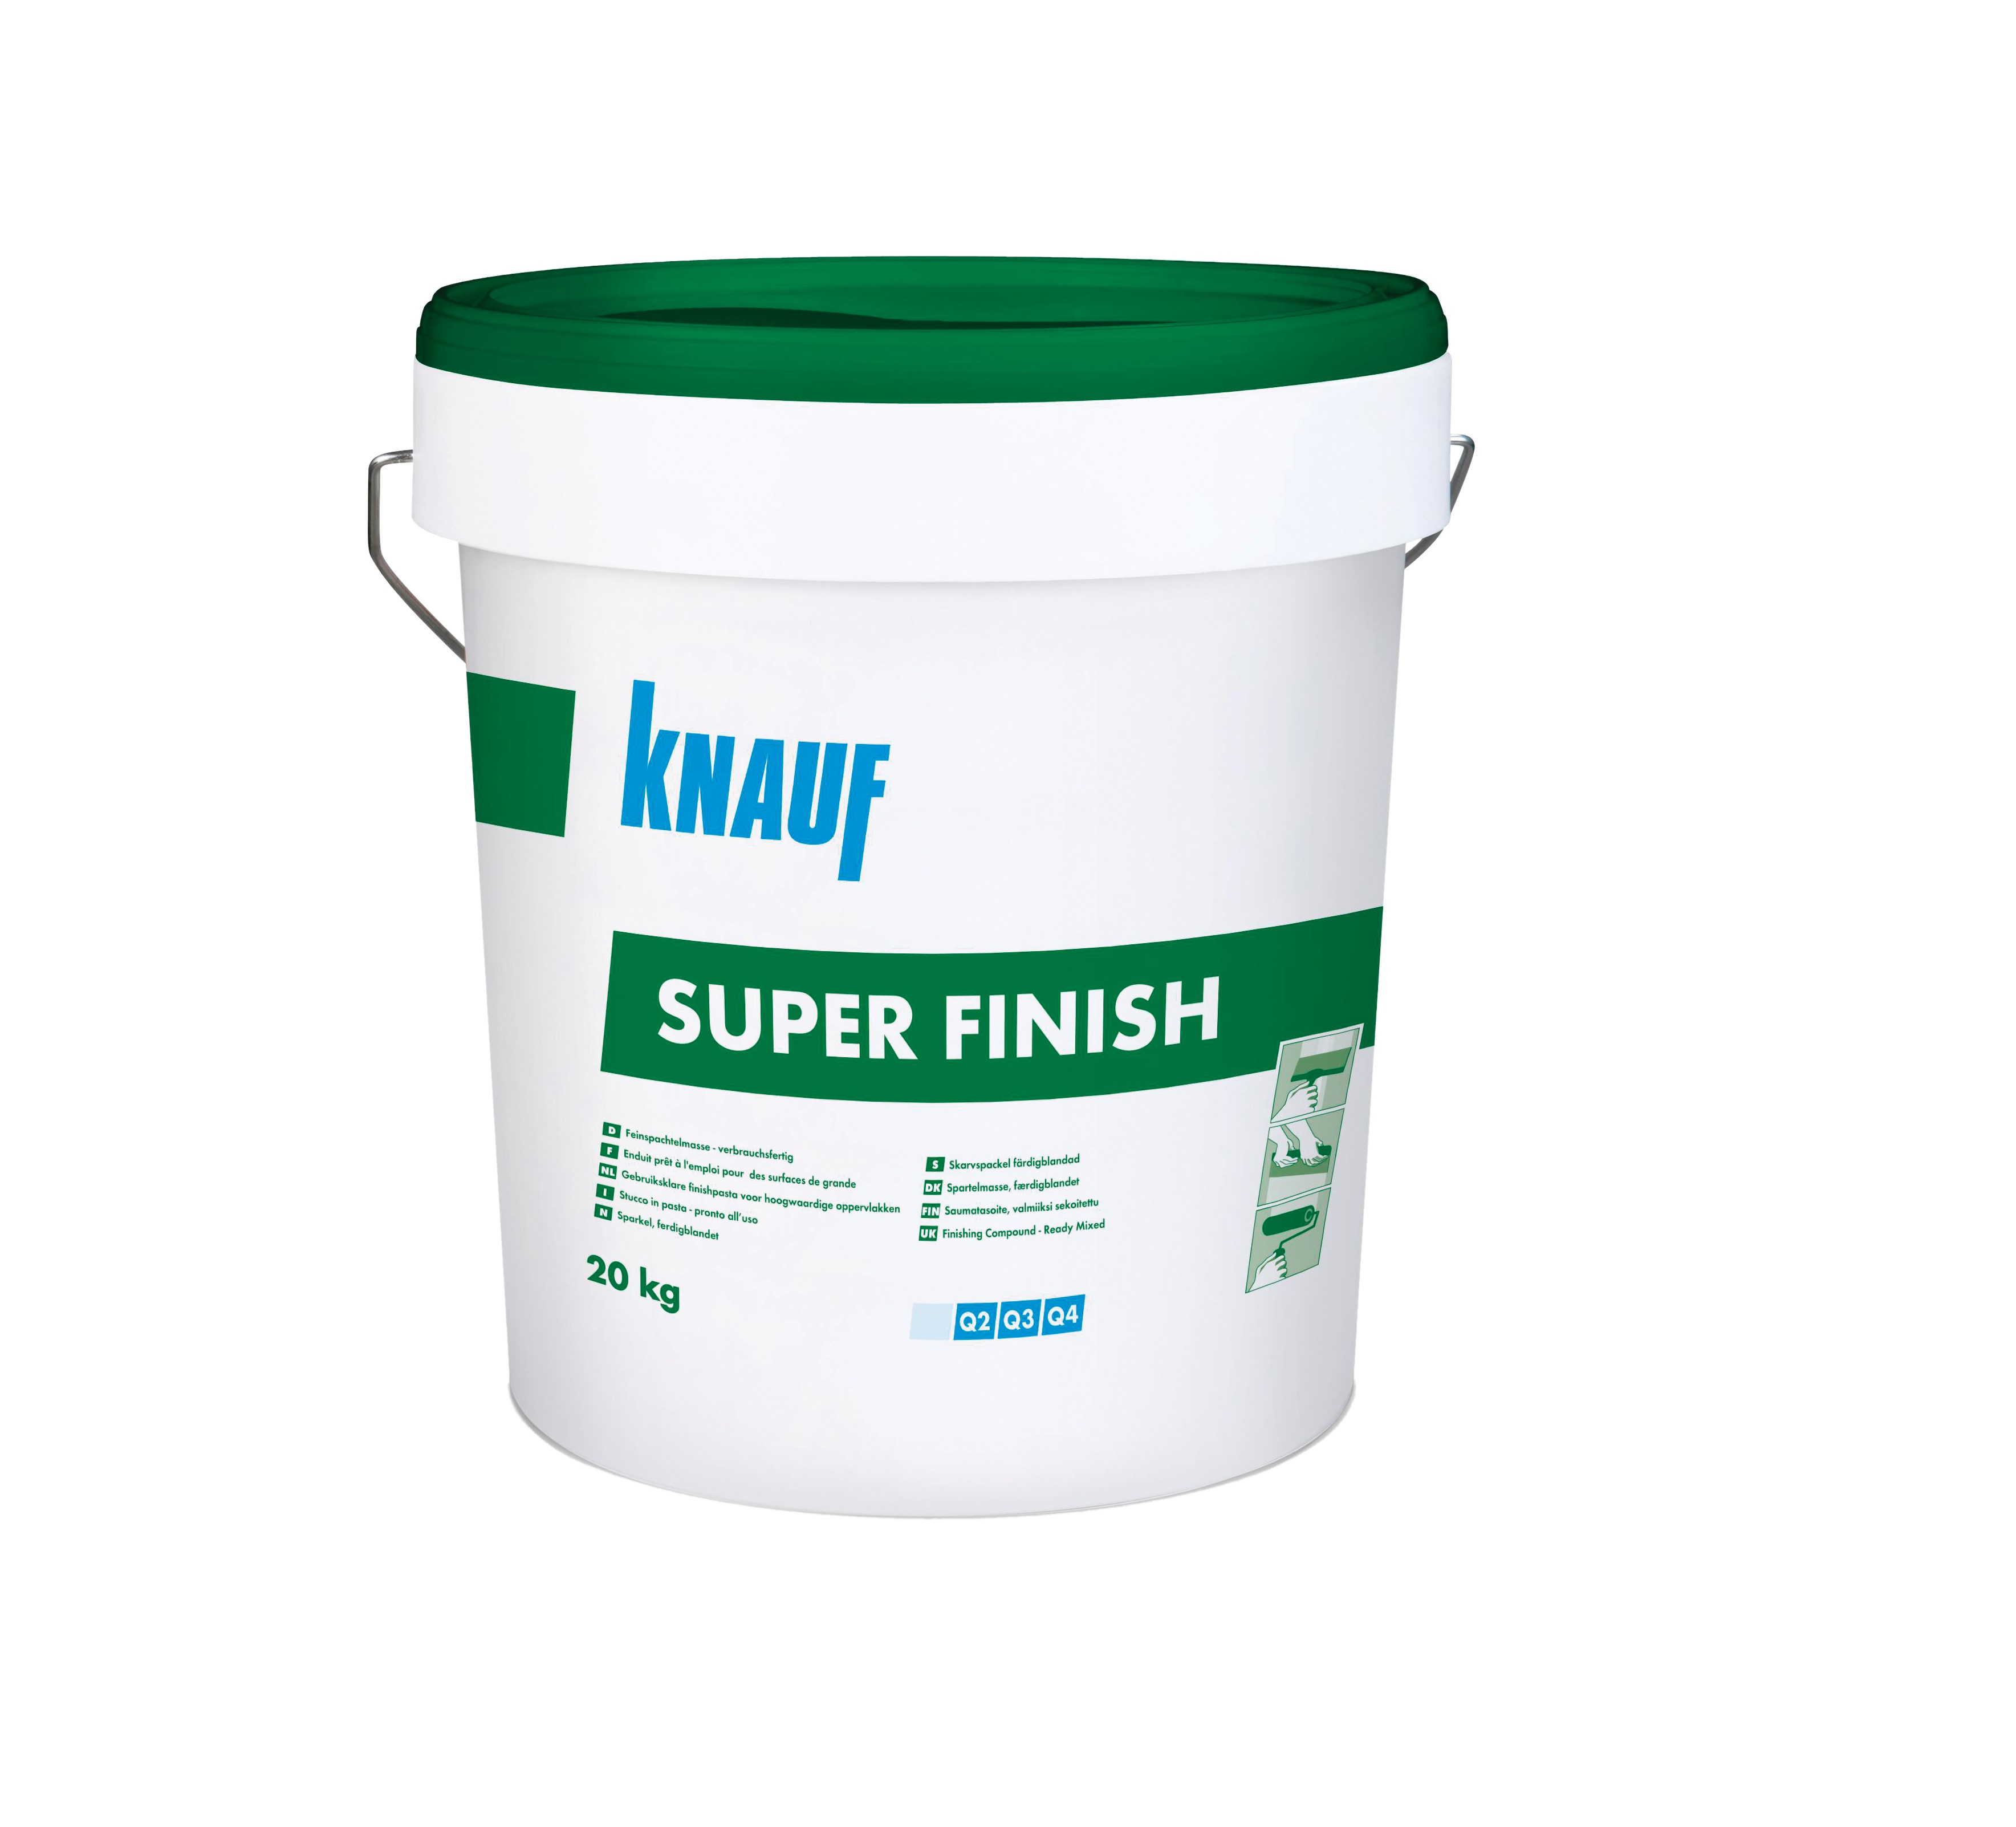 Glet masa za obradu spojeva i površina, SUPERFINISH, 25 kg, KNAUF